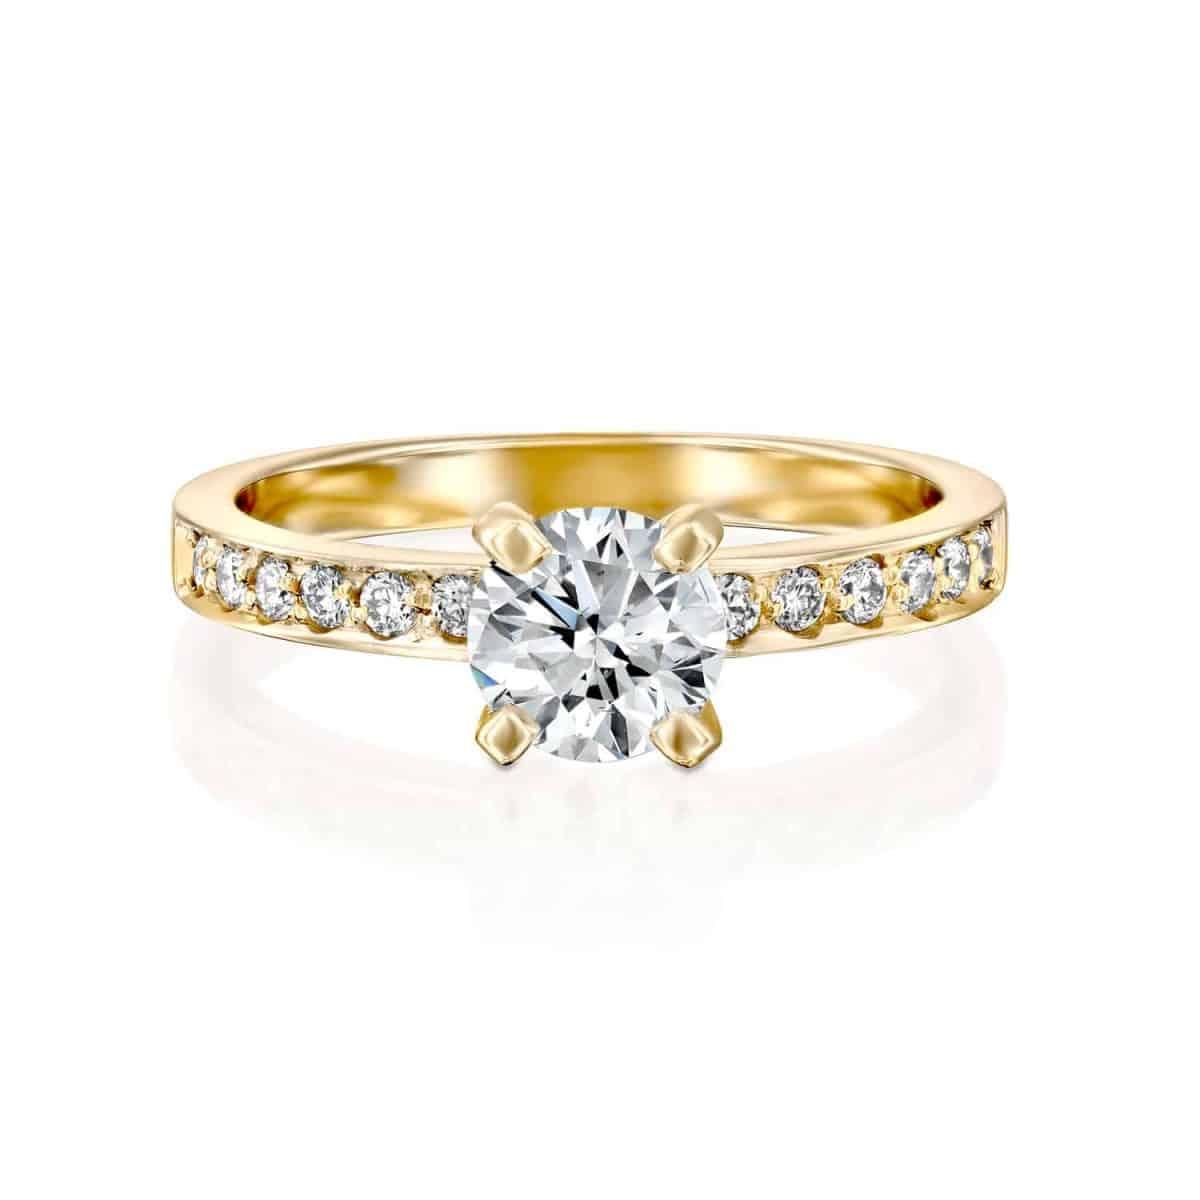 Lena - Lab Grown Diamond Engagement Ring 1.10ct. - laying